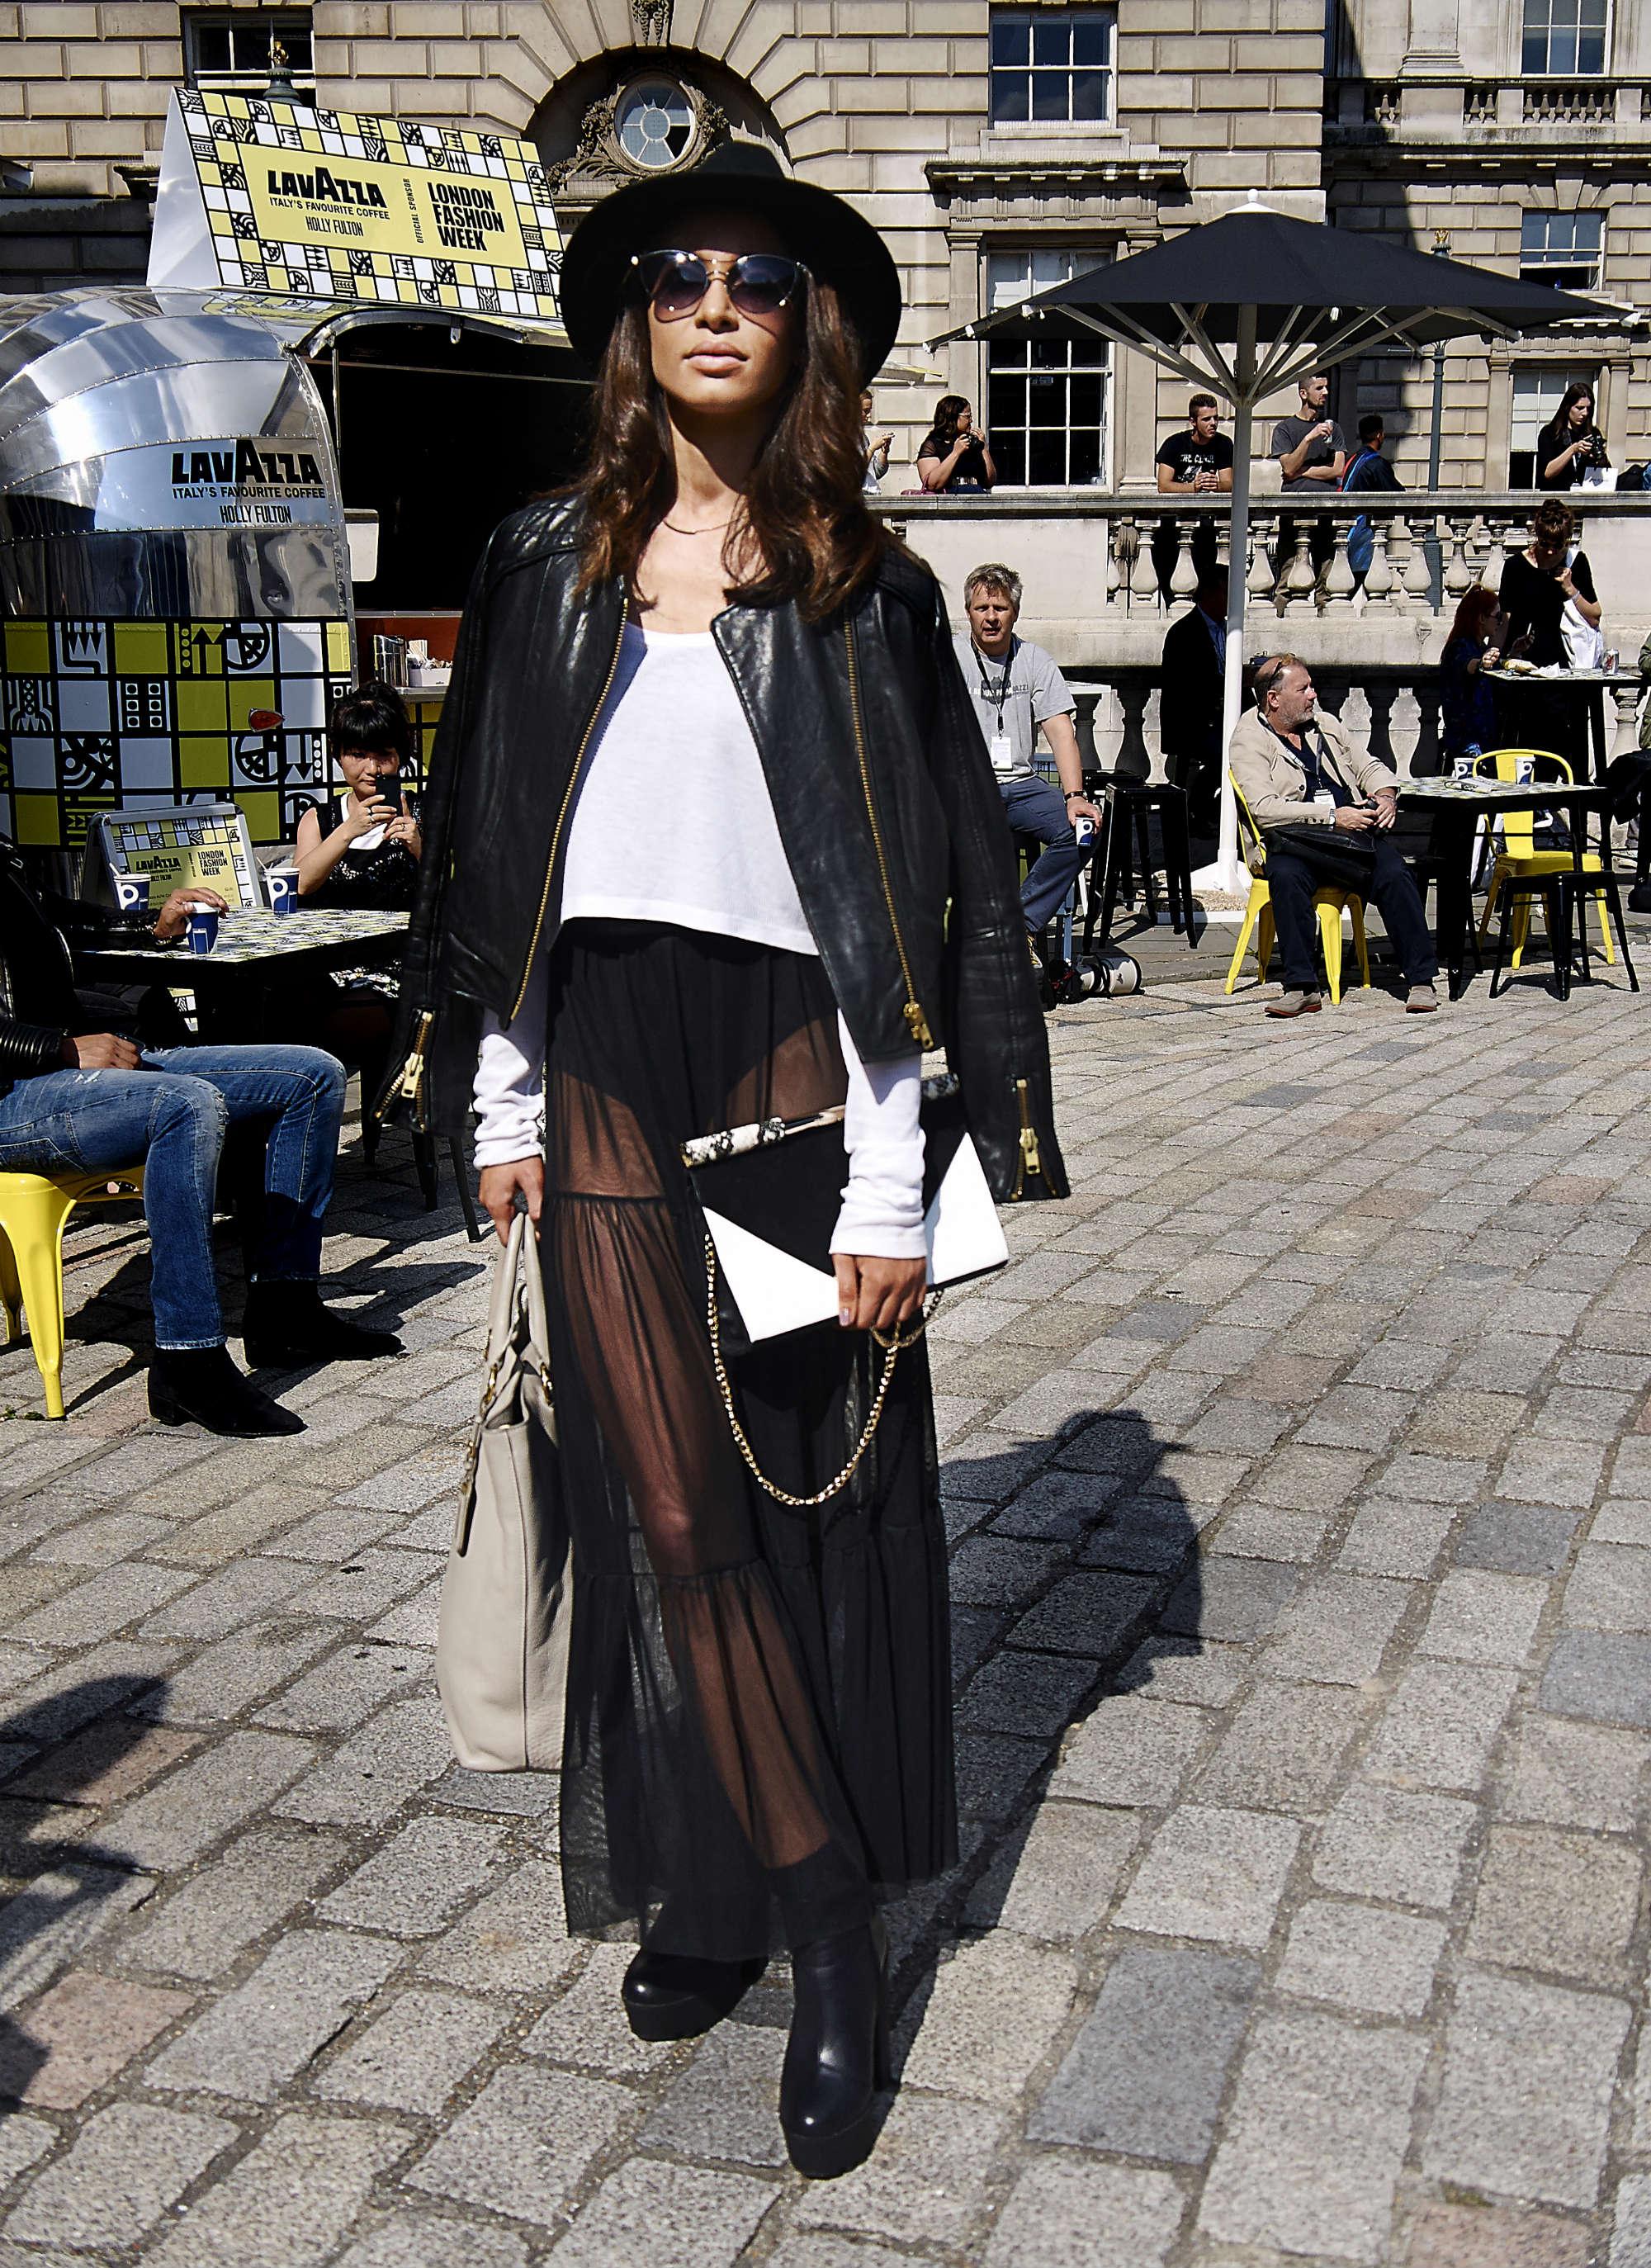 London Fashion Week Ss15 Street Style Day 1 Ldnfashion